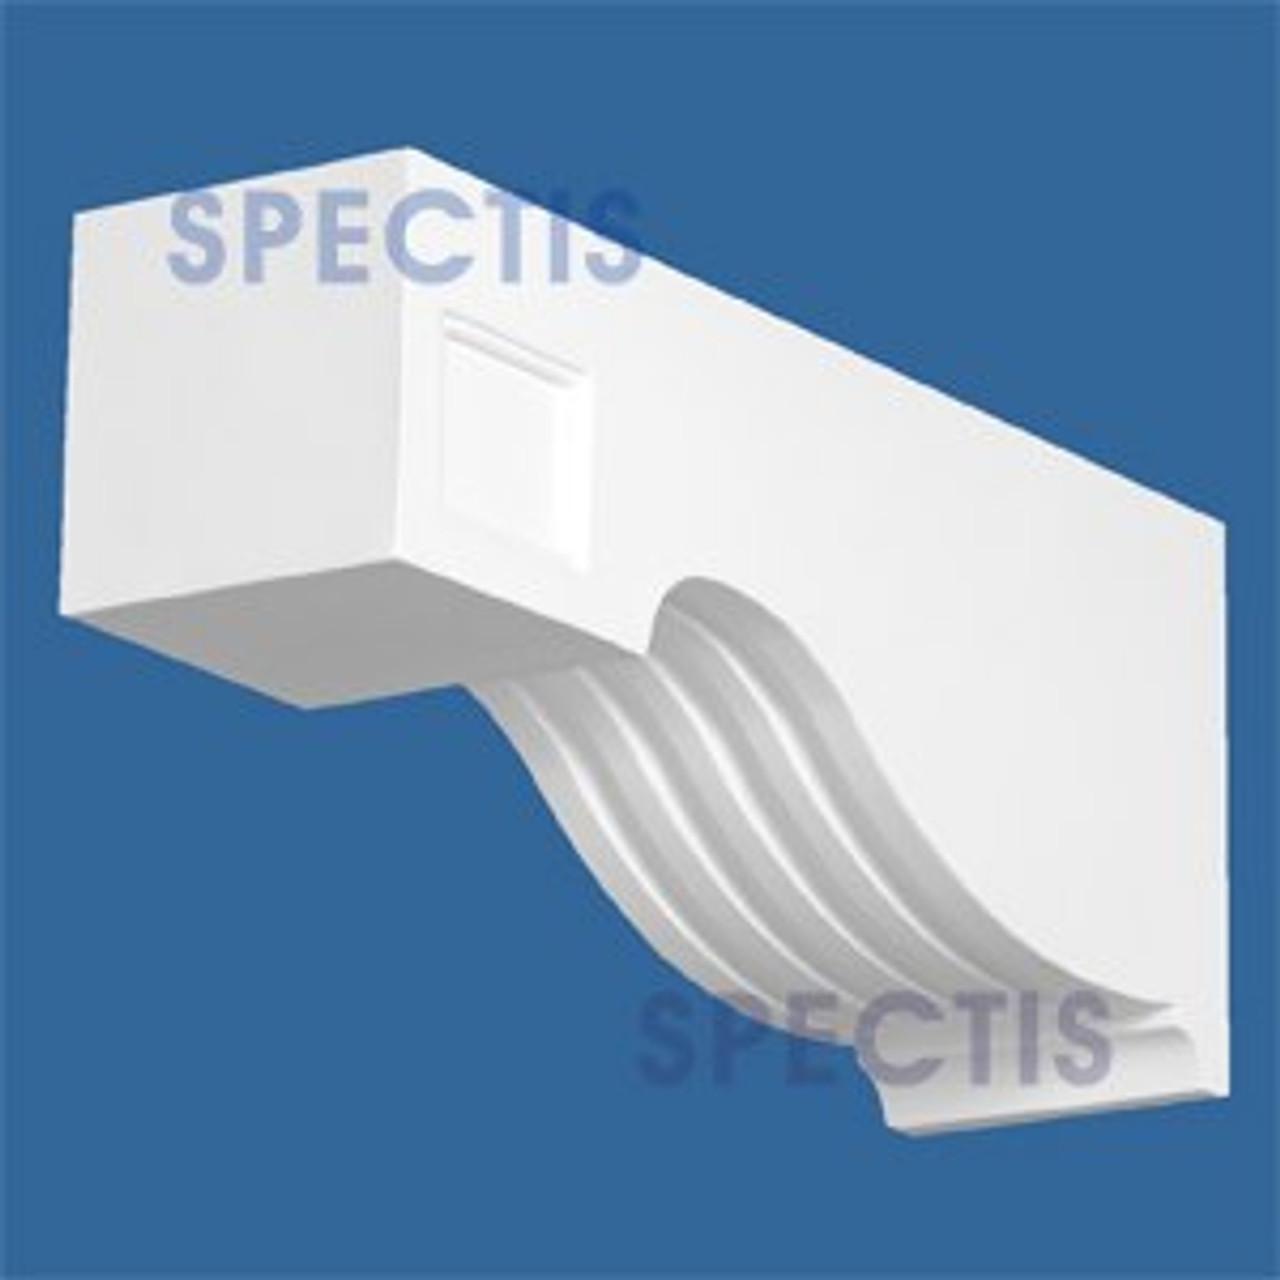 "BL2809 Corbel Block or Eave Bracket 3.5""W x 5.5""H x 13"" P"